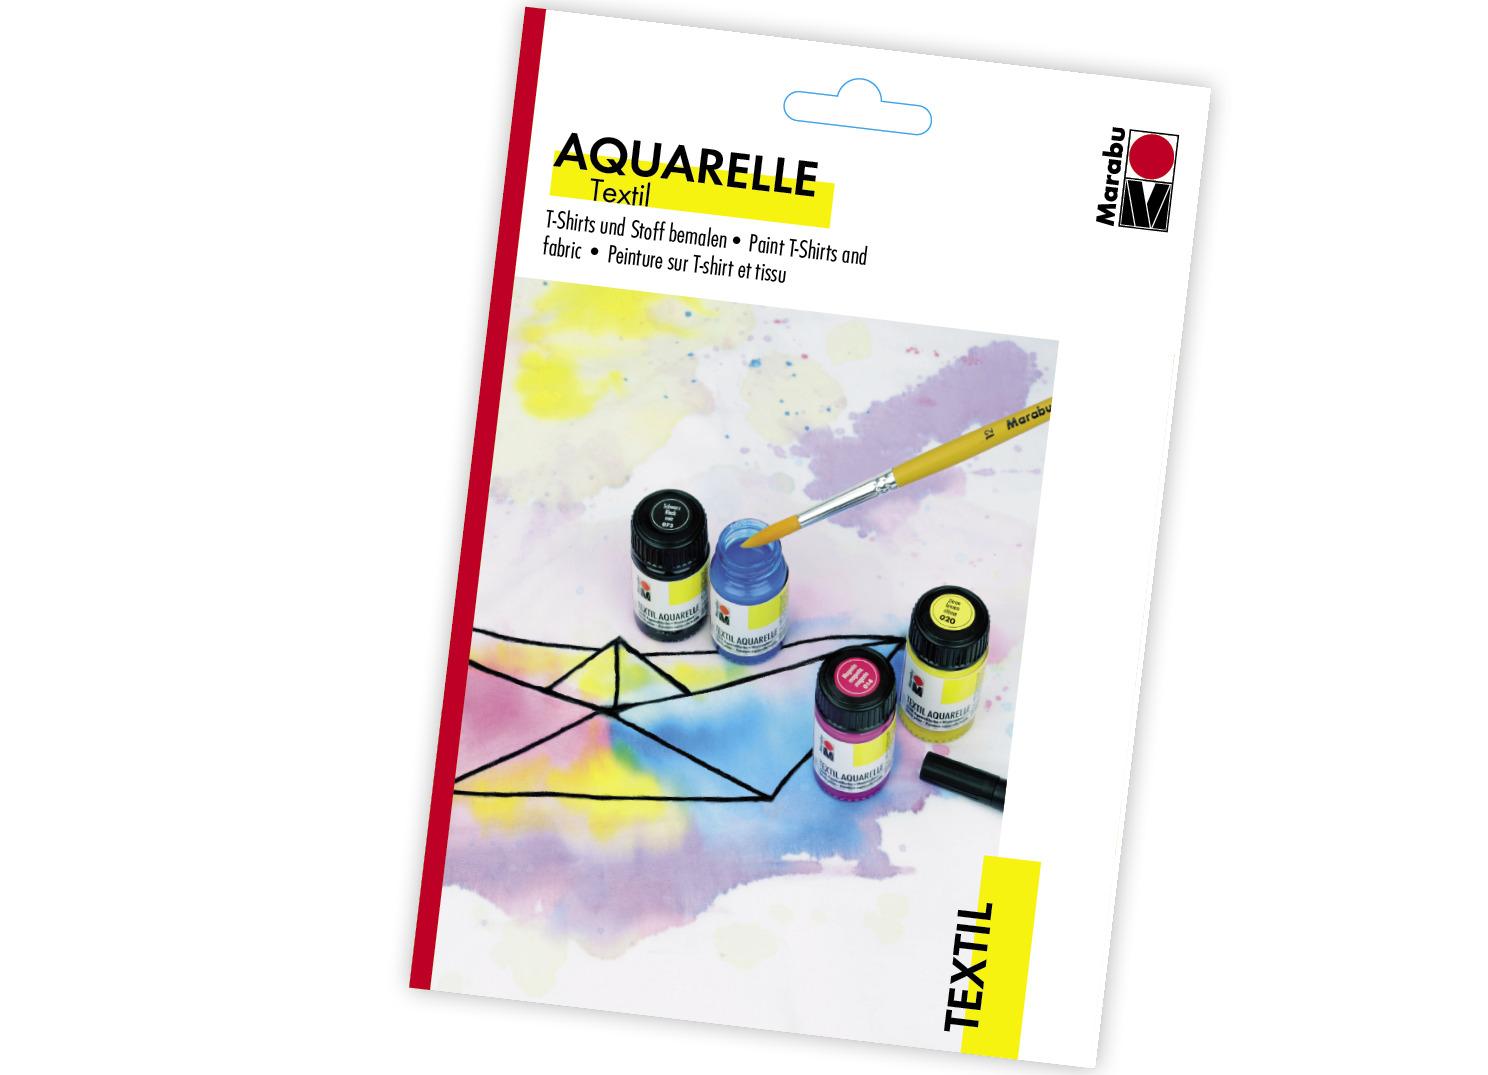 Marabu-Textil-Print-Colouring-Aquarelle-Title.jpg